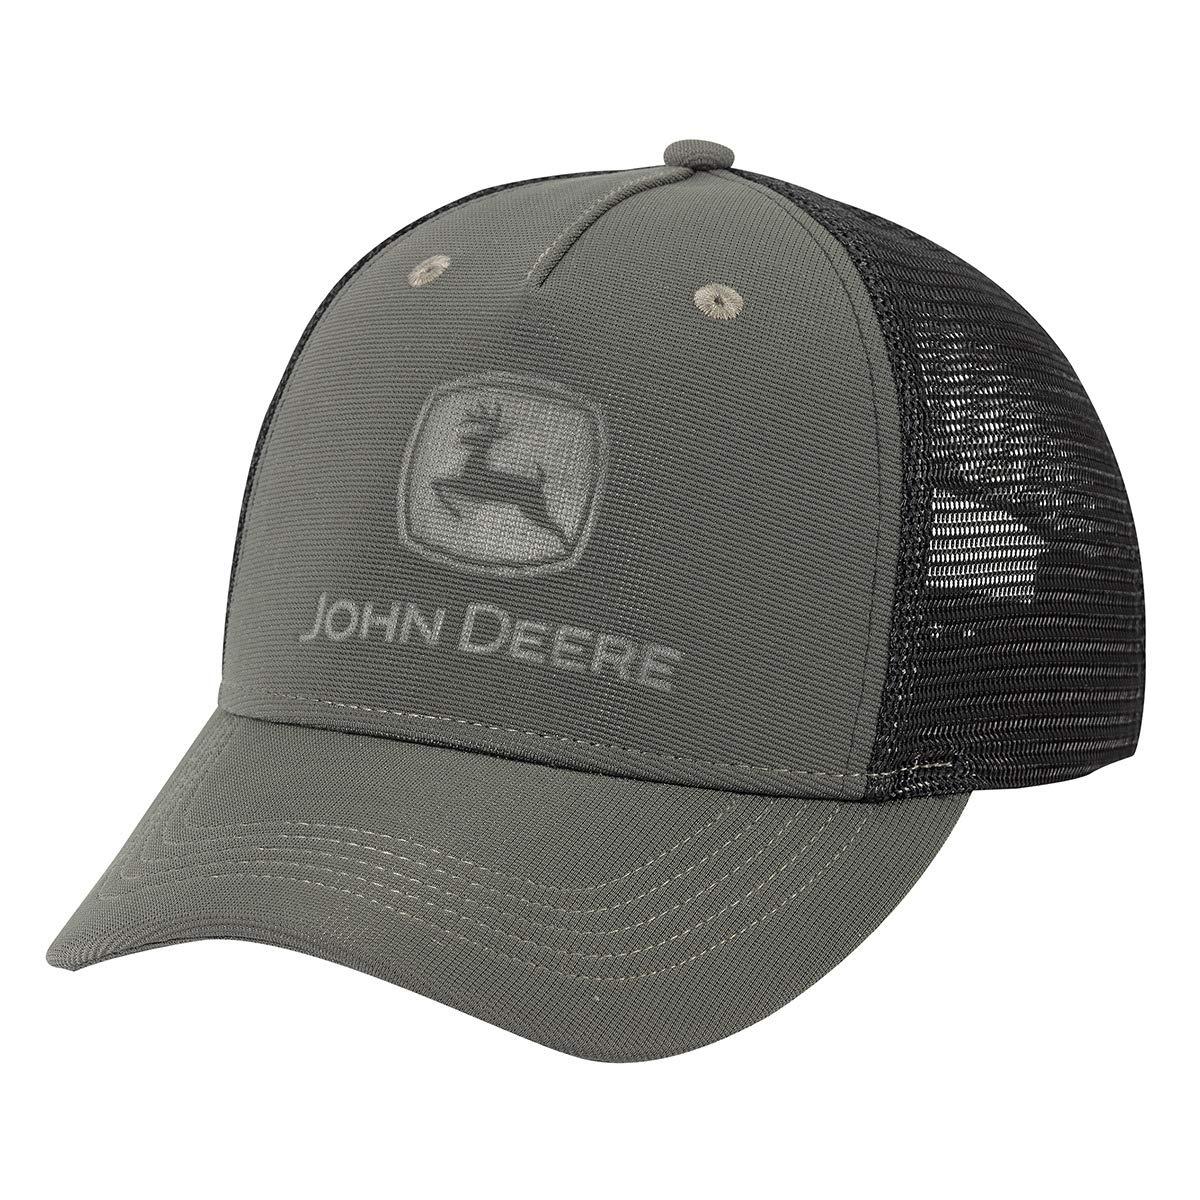 John Deere Olive Debossed Hat/Cap - LP76093